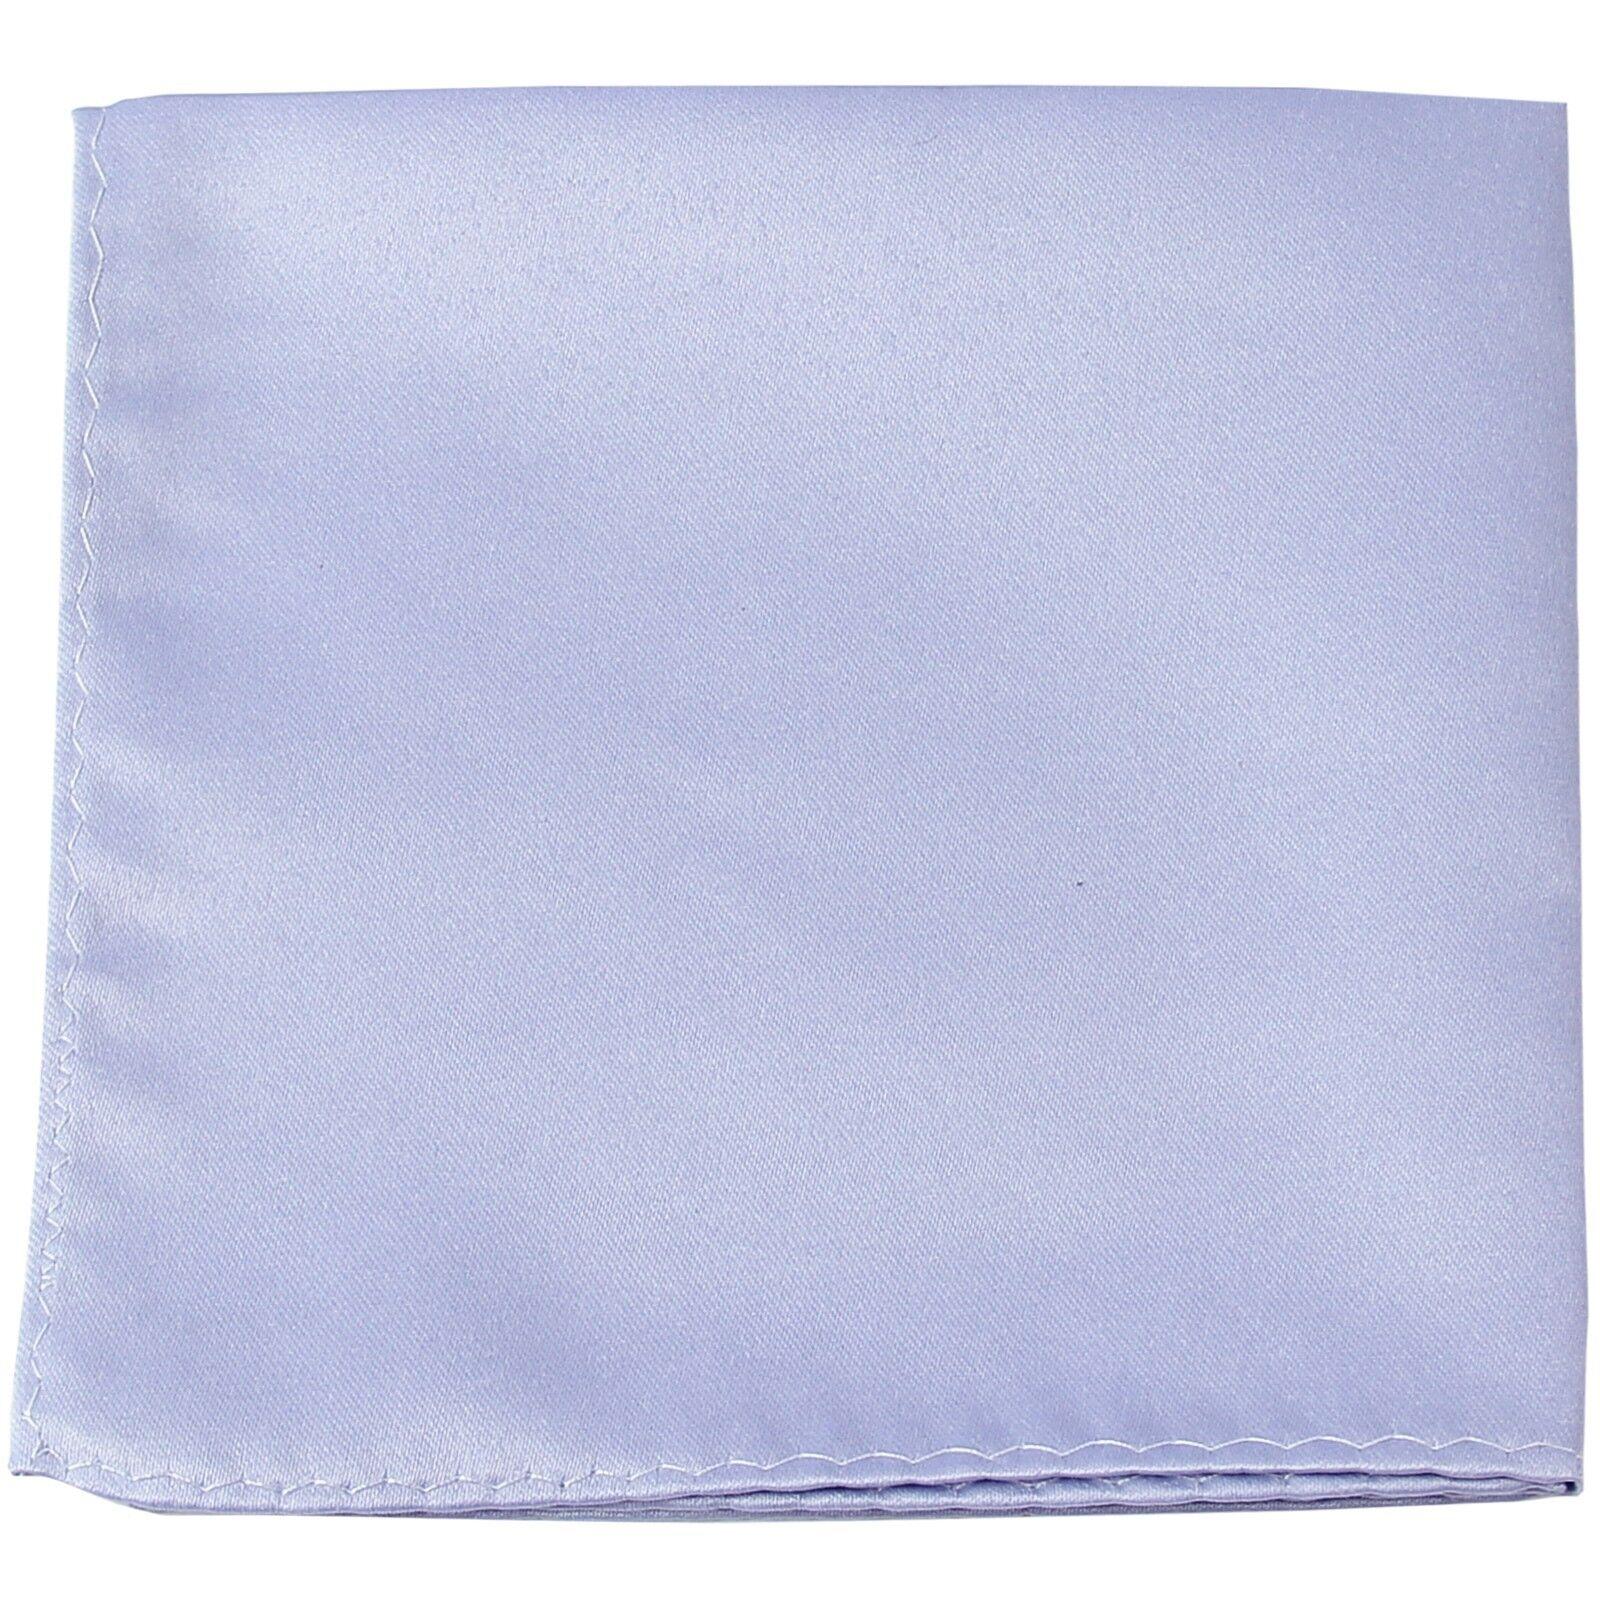 MANZO Men's Polyester Matt Finish Pocket Square Hankie Only Smoke Gray